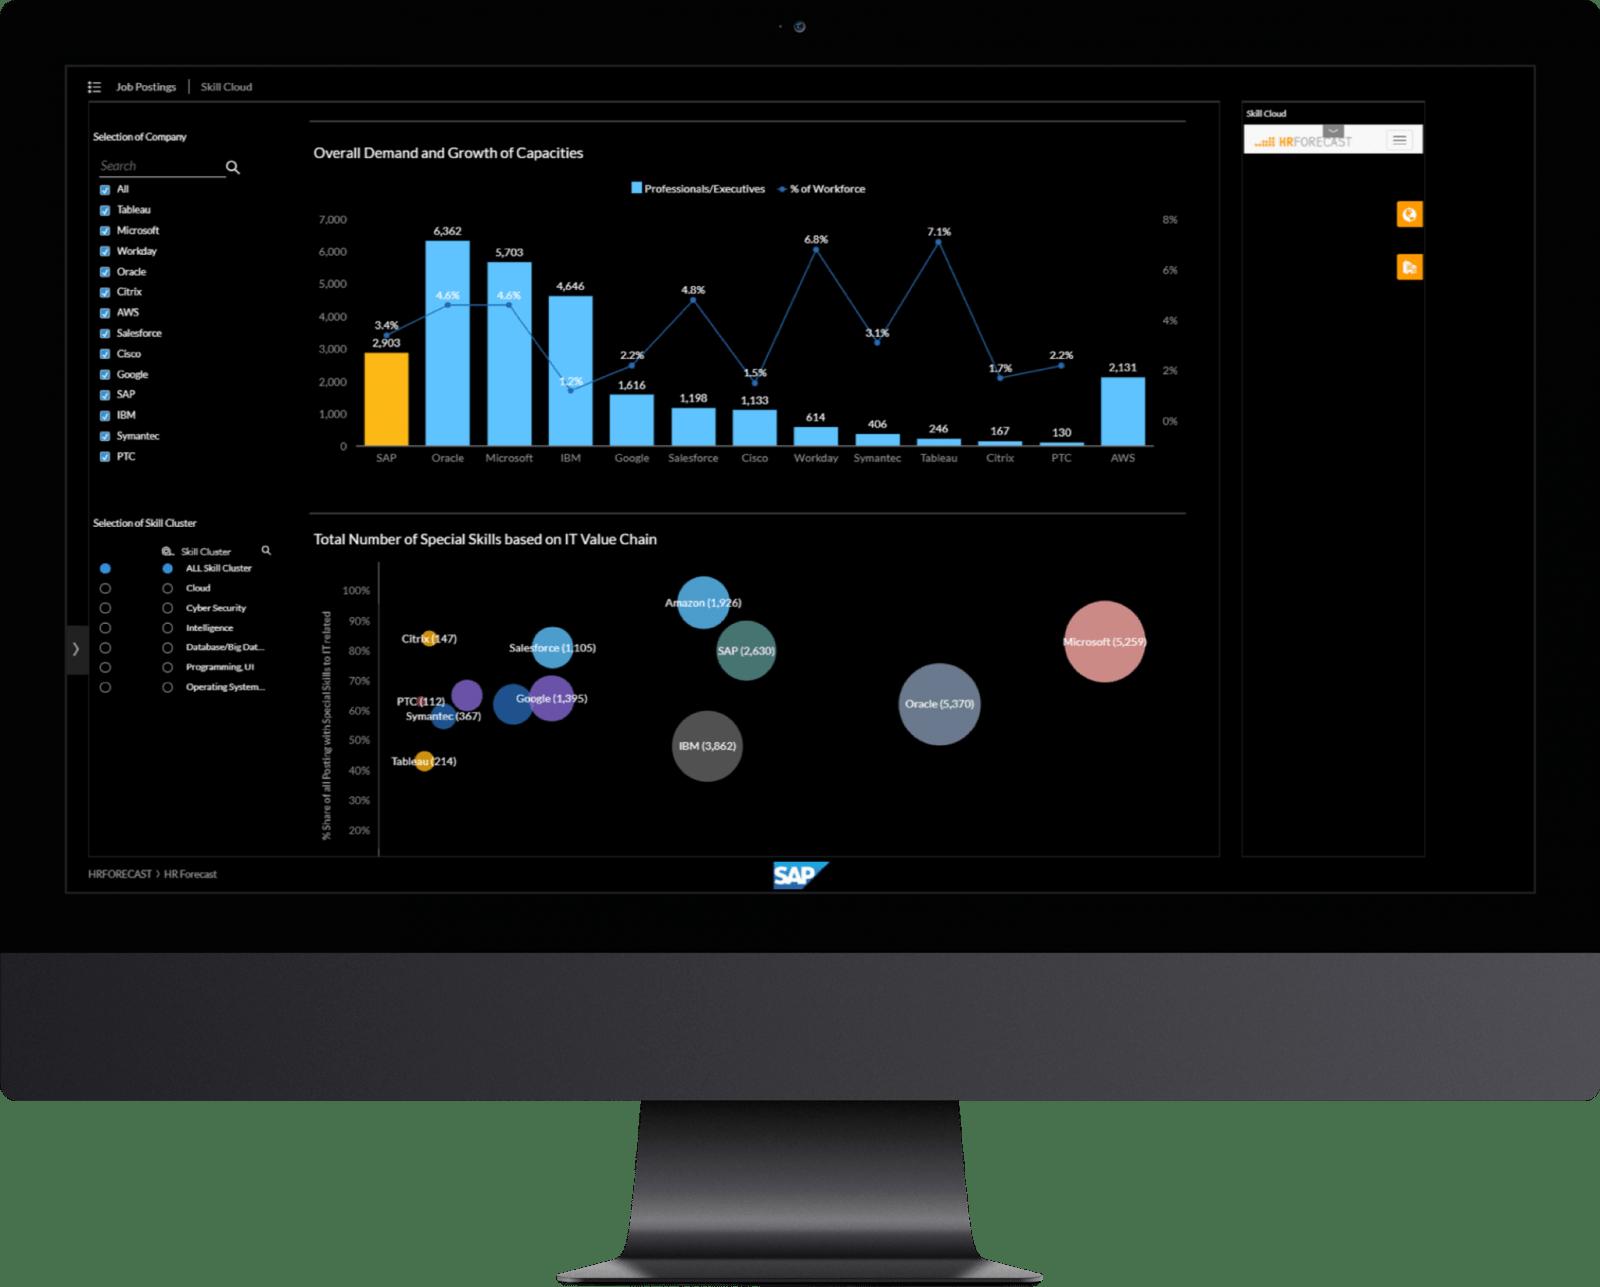 SAP: Development of a labor market & competitor radar